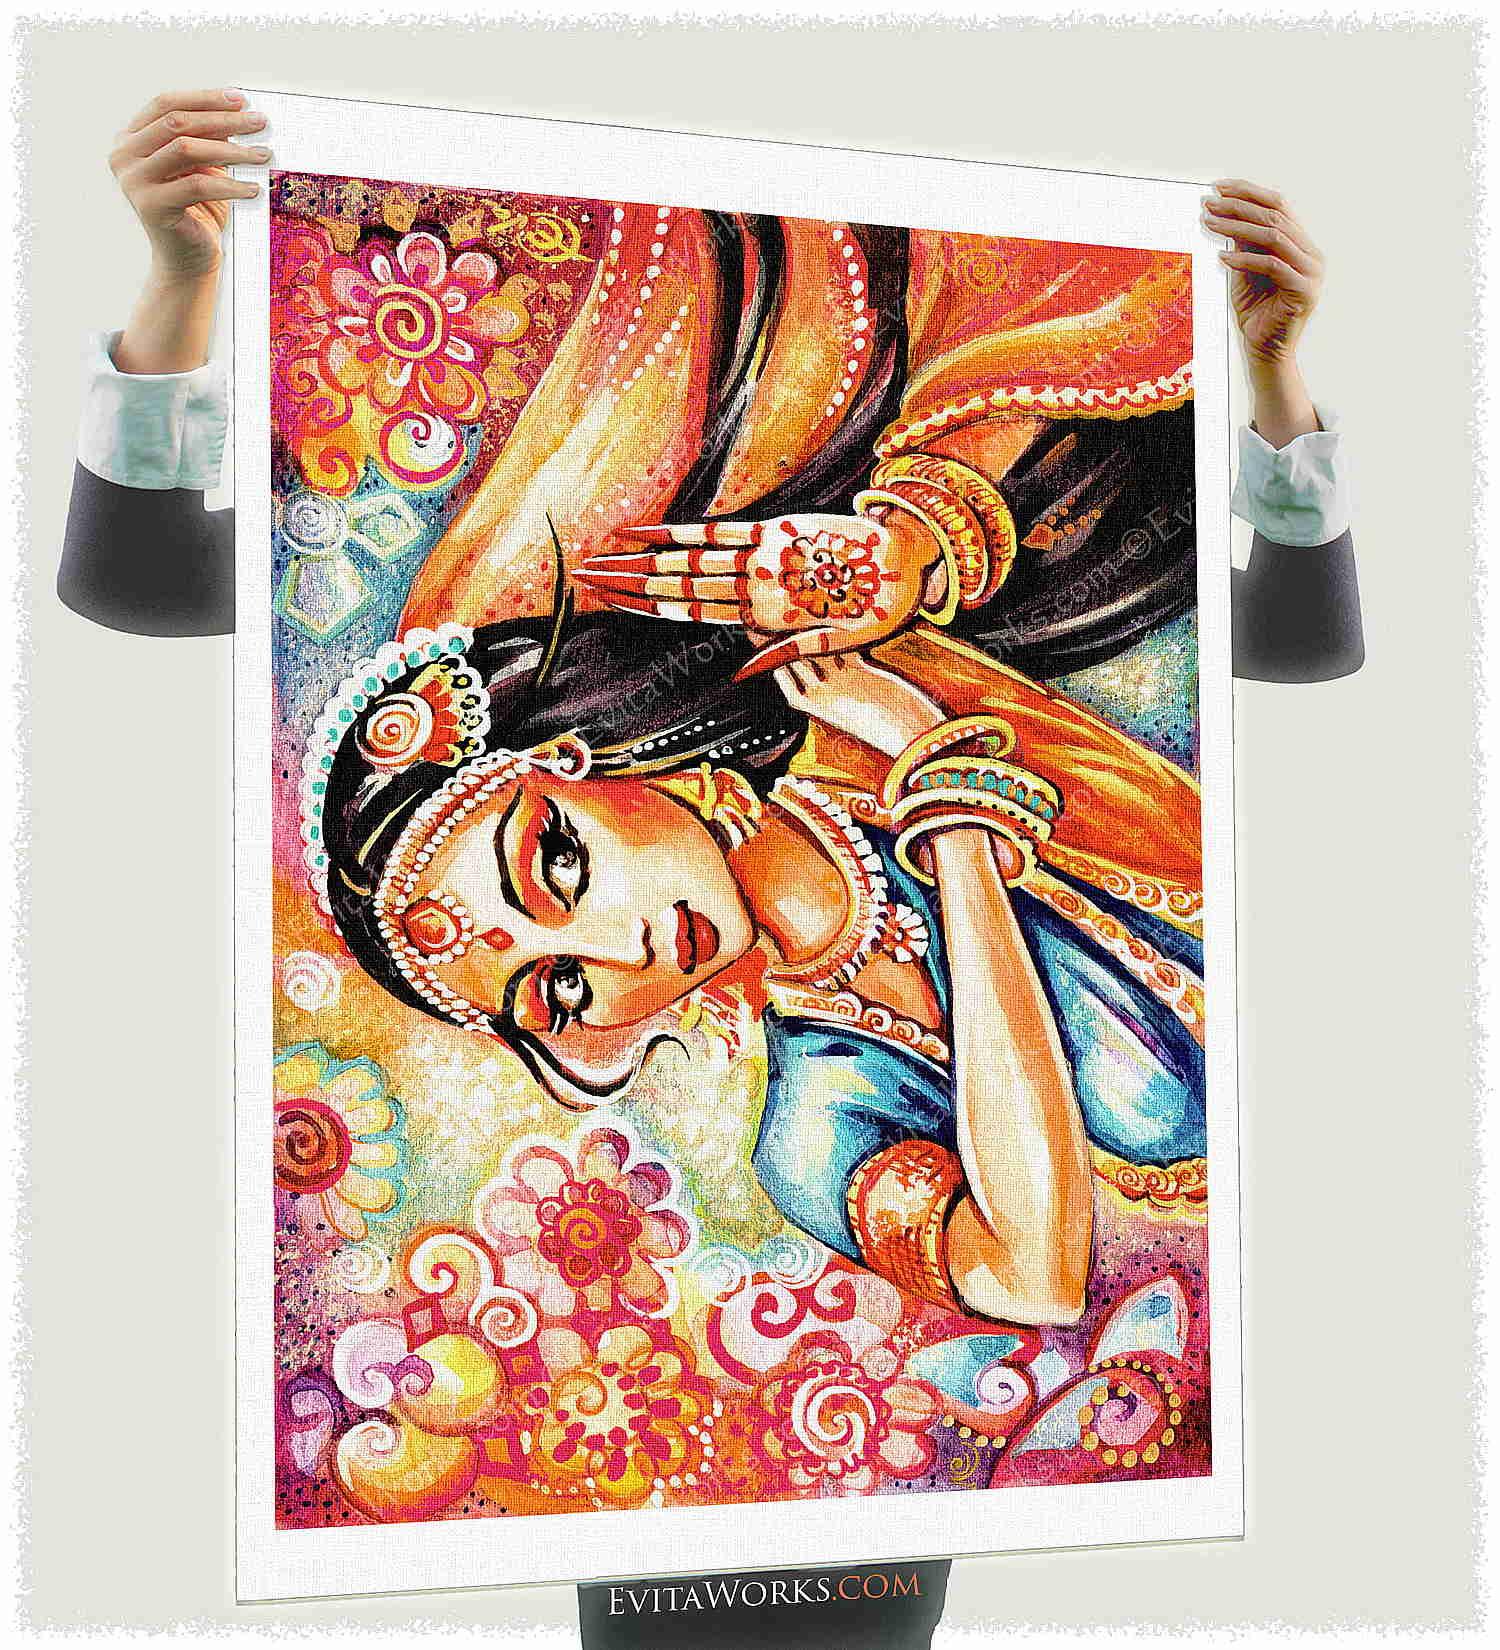 oa belly dancer 07 a1 ~ EvitaWorks